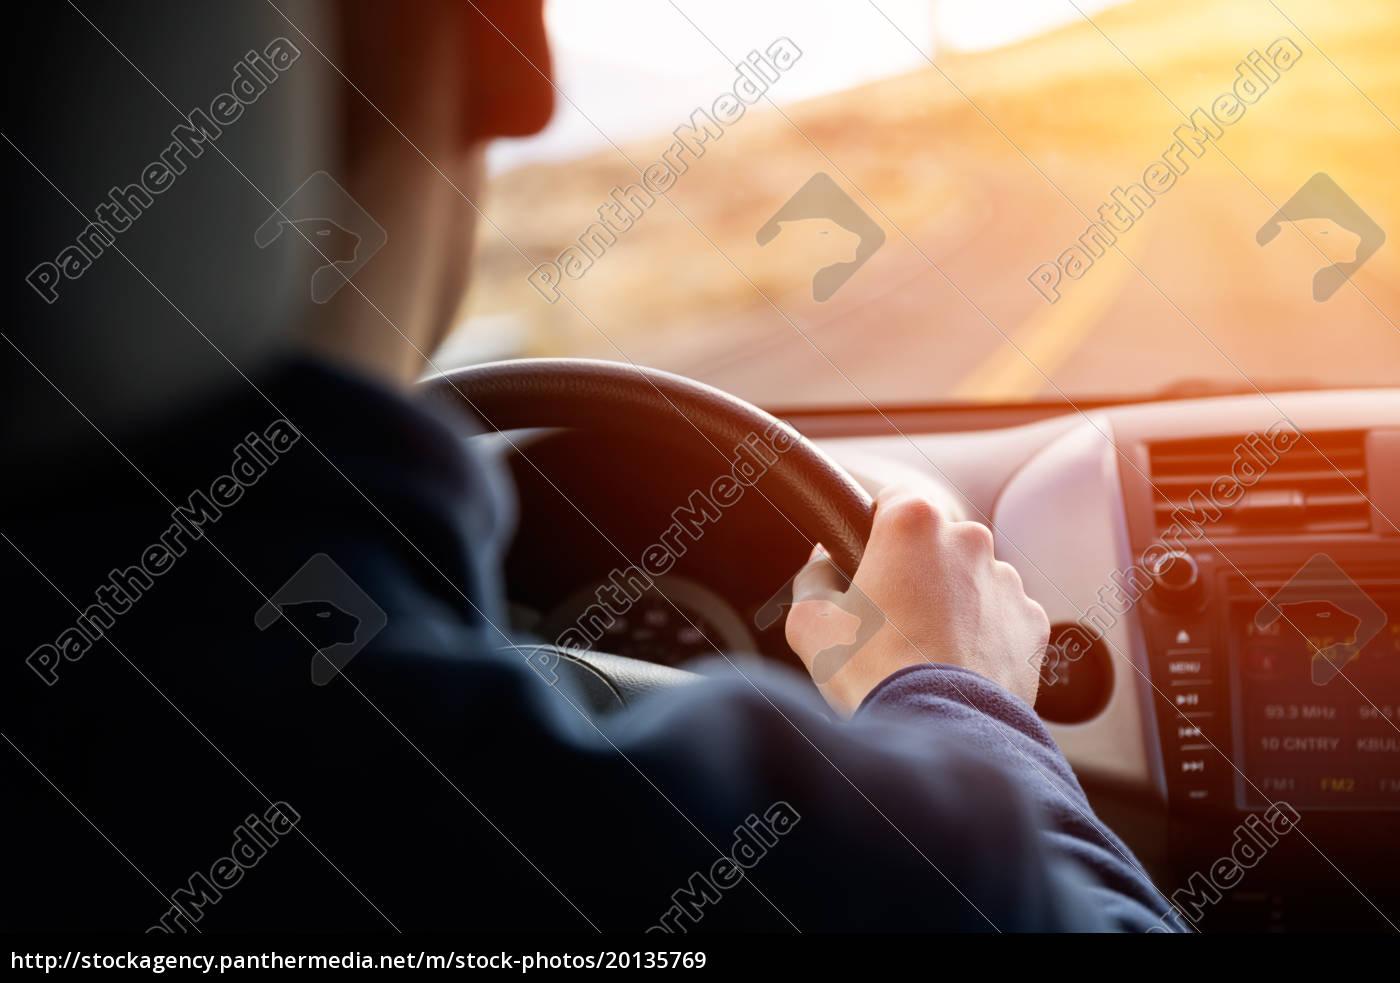 driving, car, hands, on, steering, wheel - 20135769